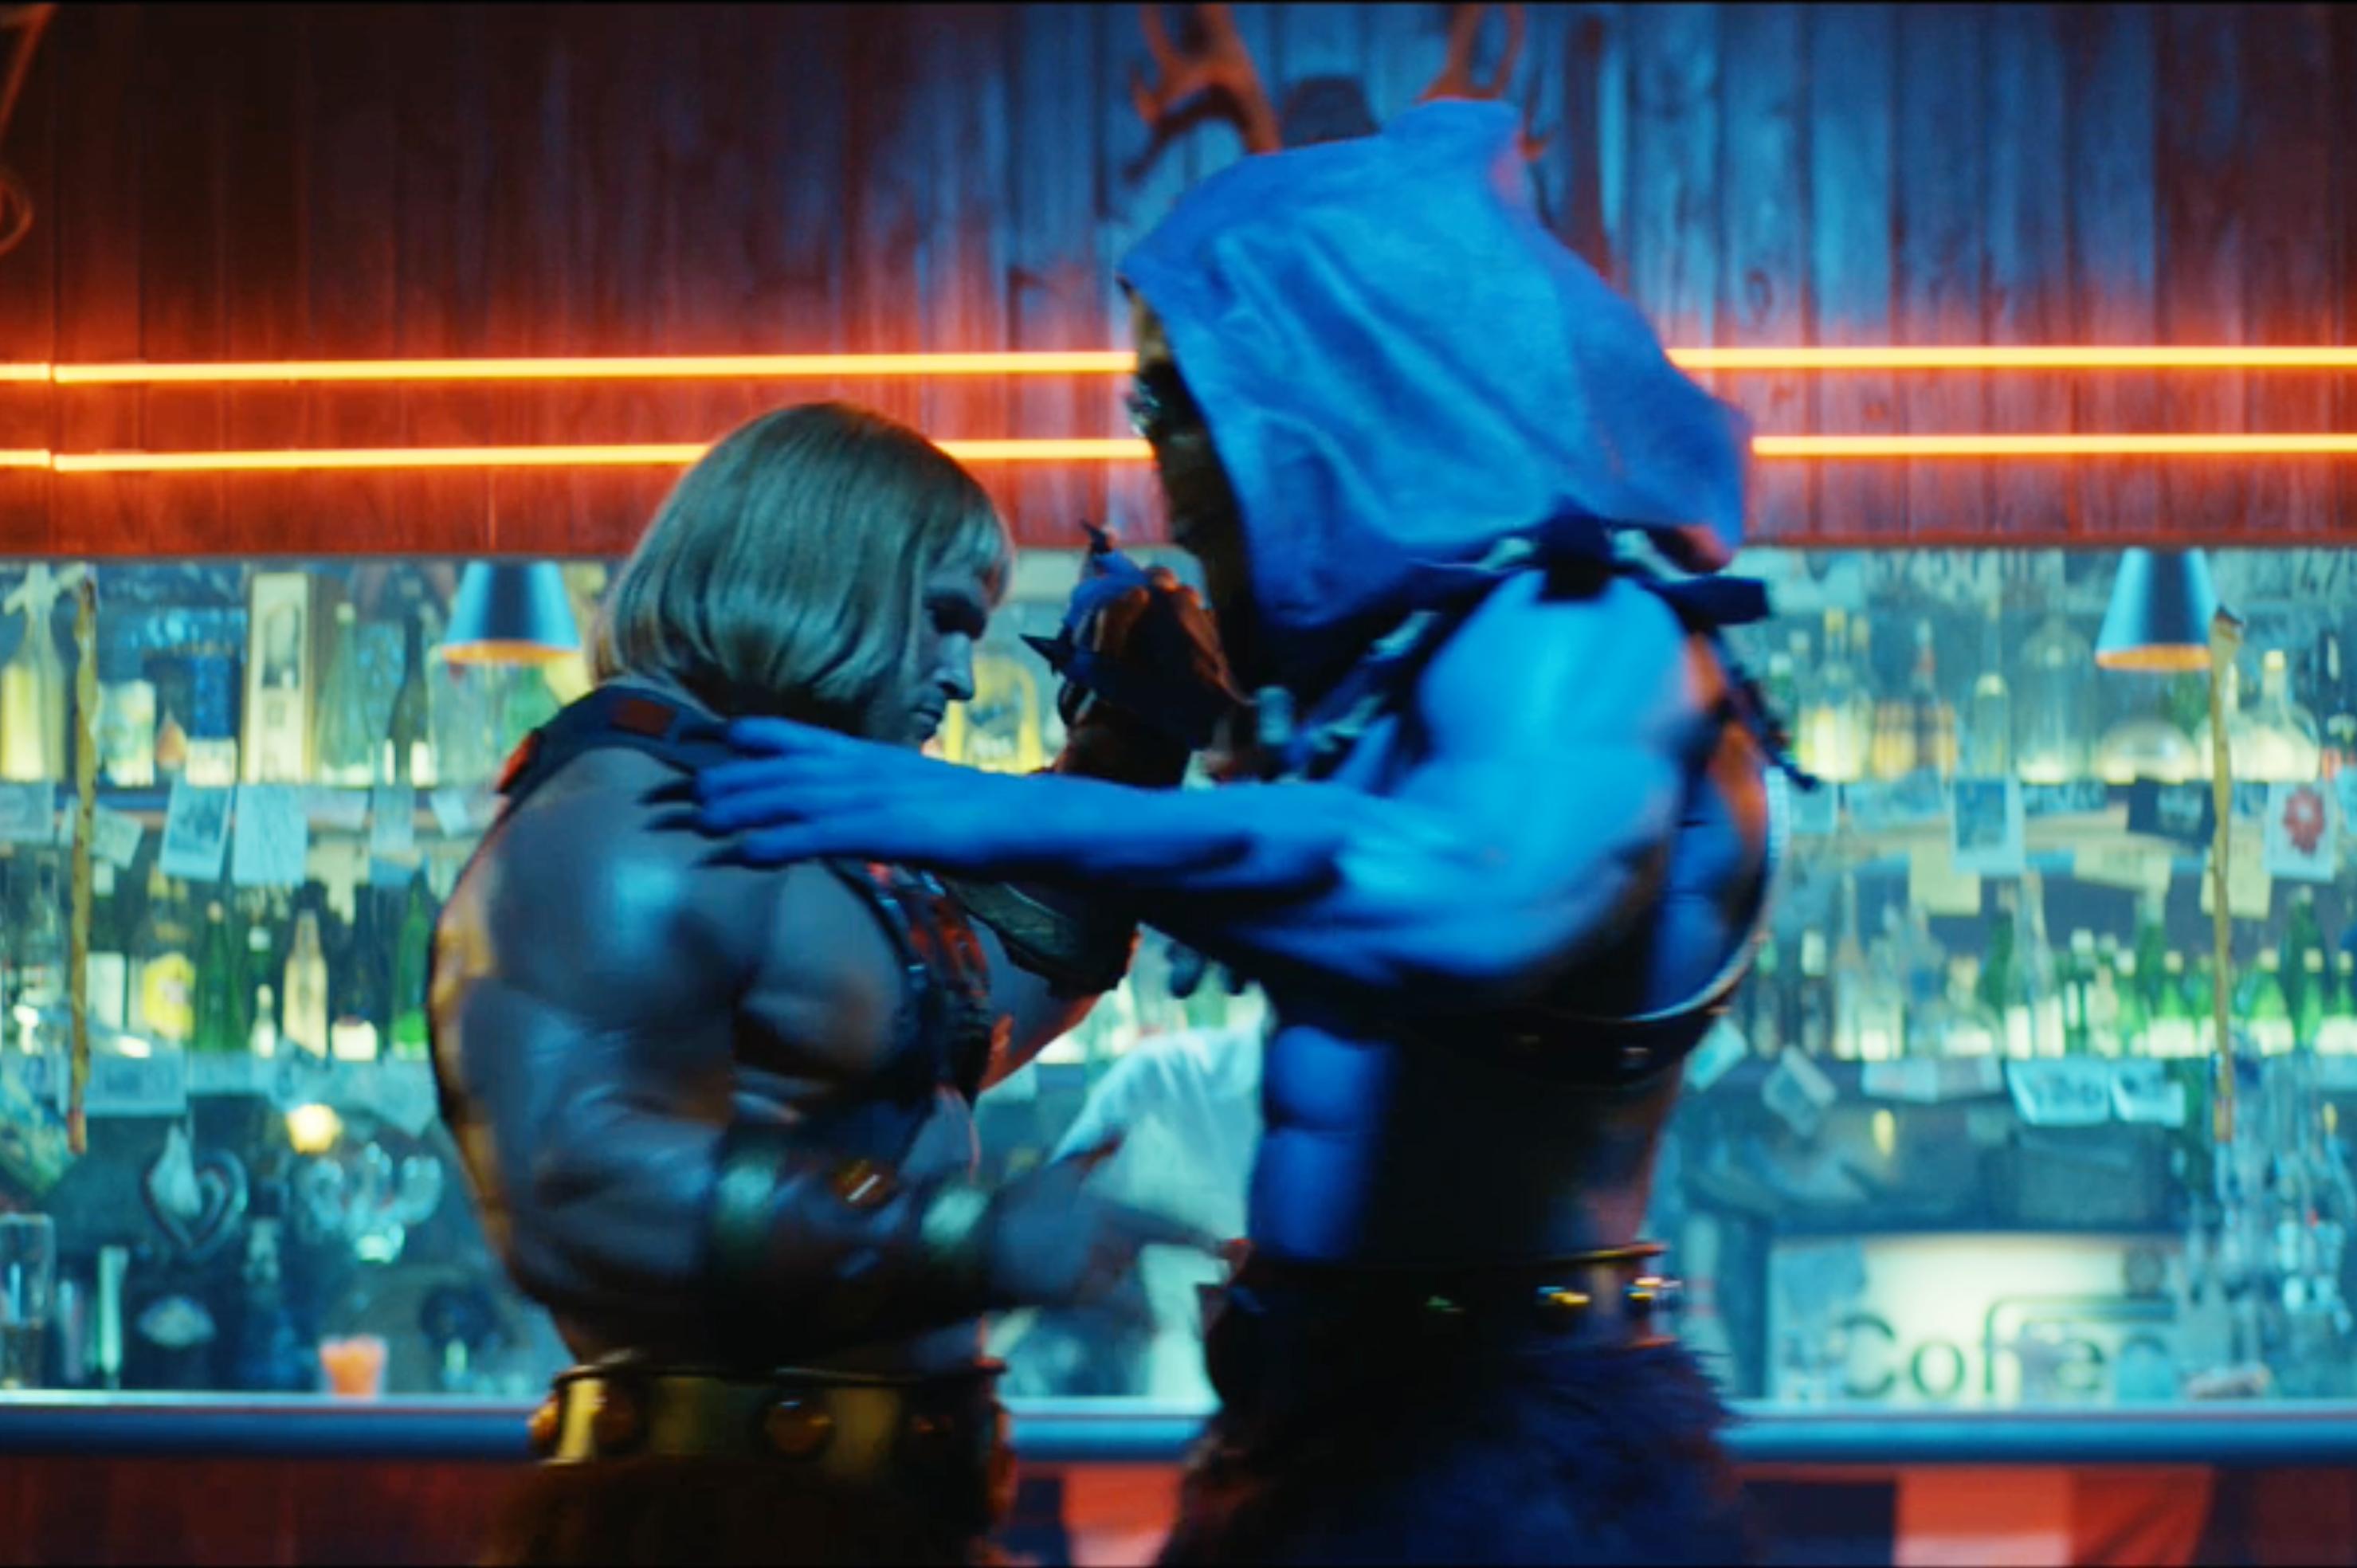 MoneySupermarket.com He-Man and Skeletor Dirty Dancing